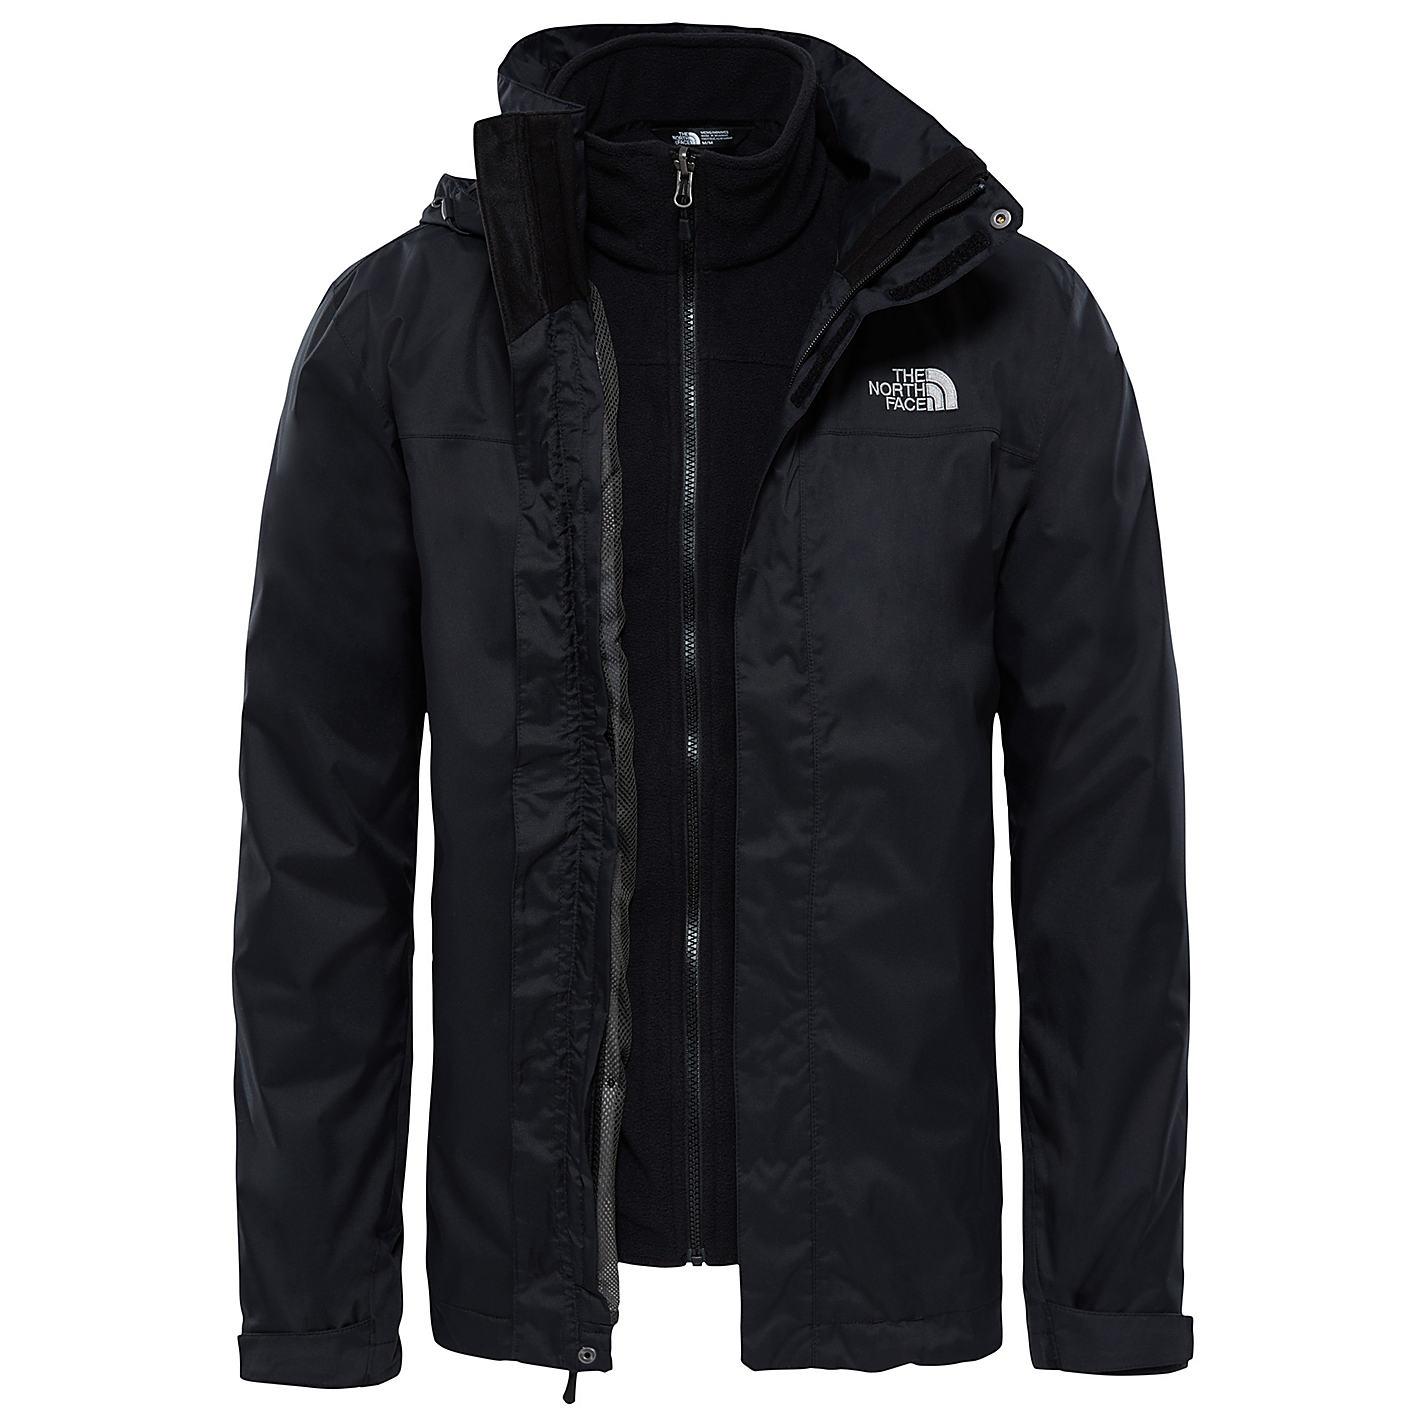 North face winter jacket uk